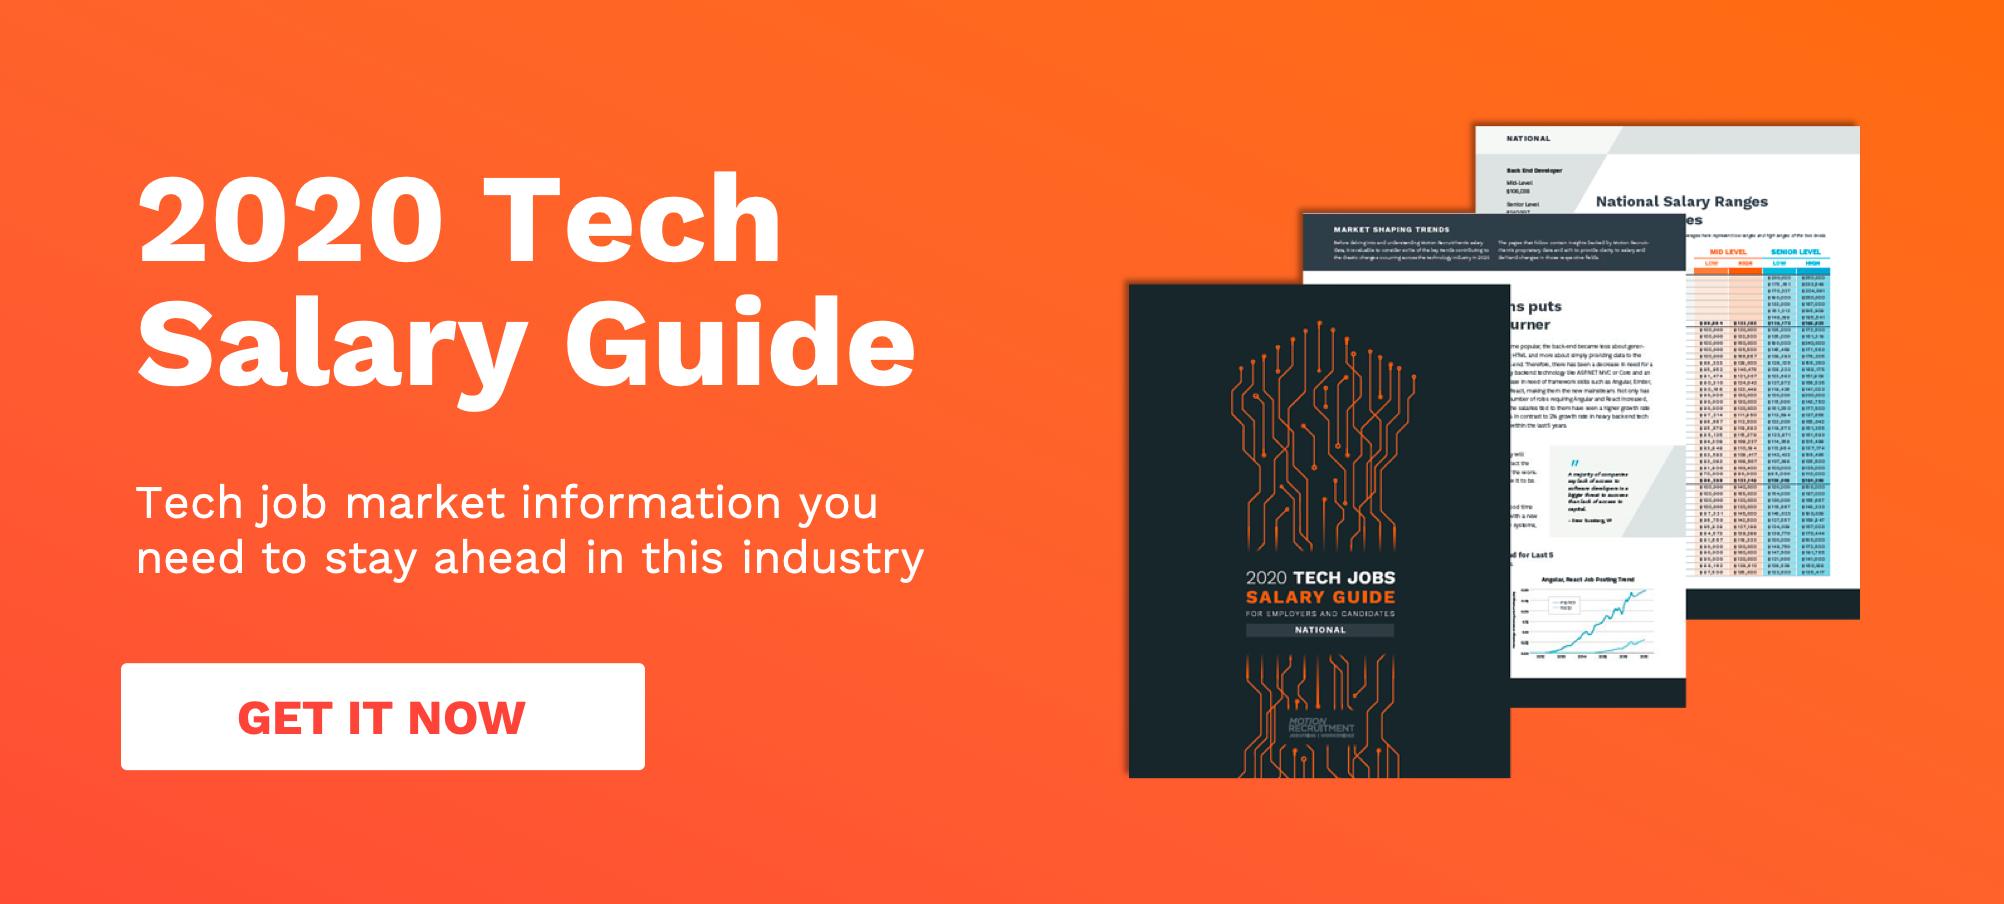 2020-tech-salary-guide